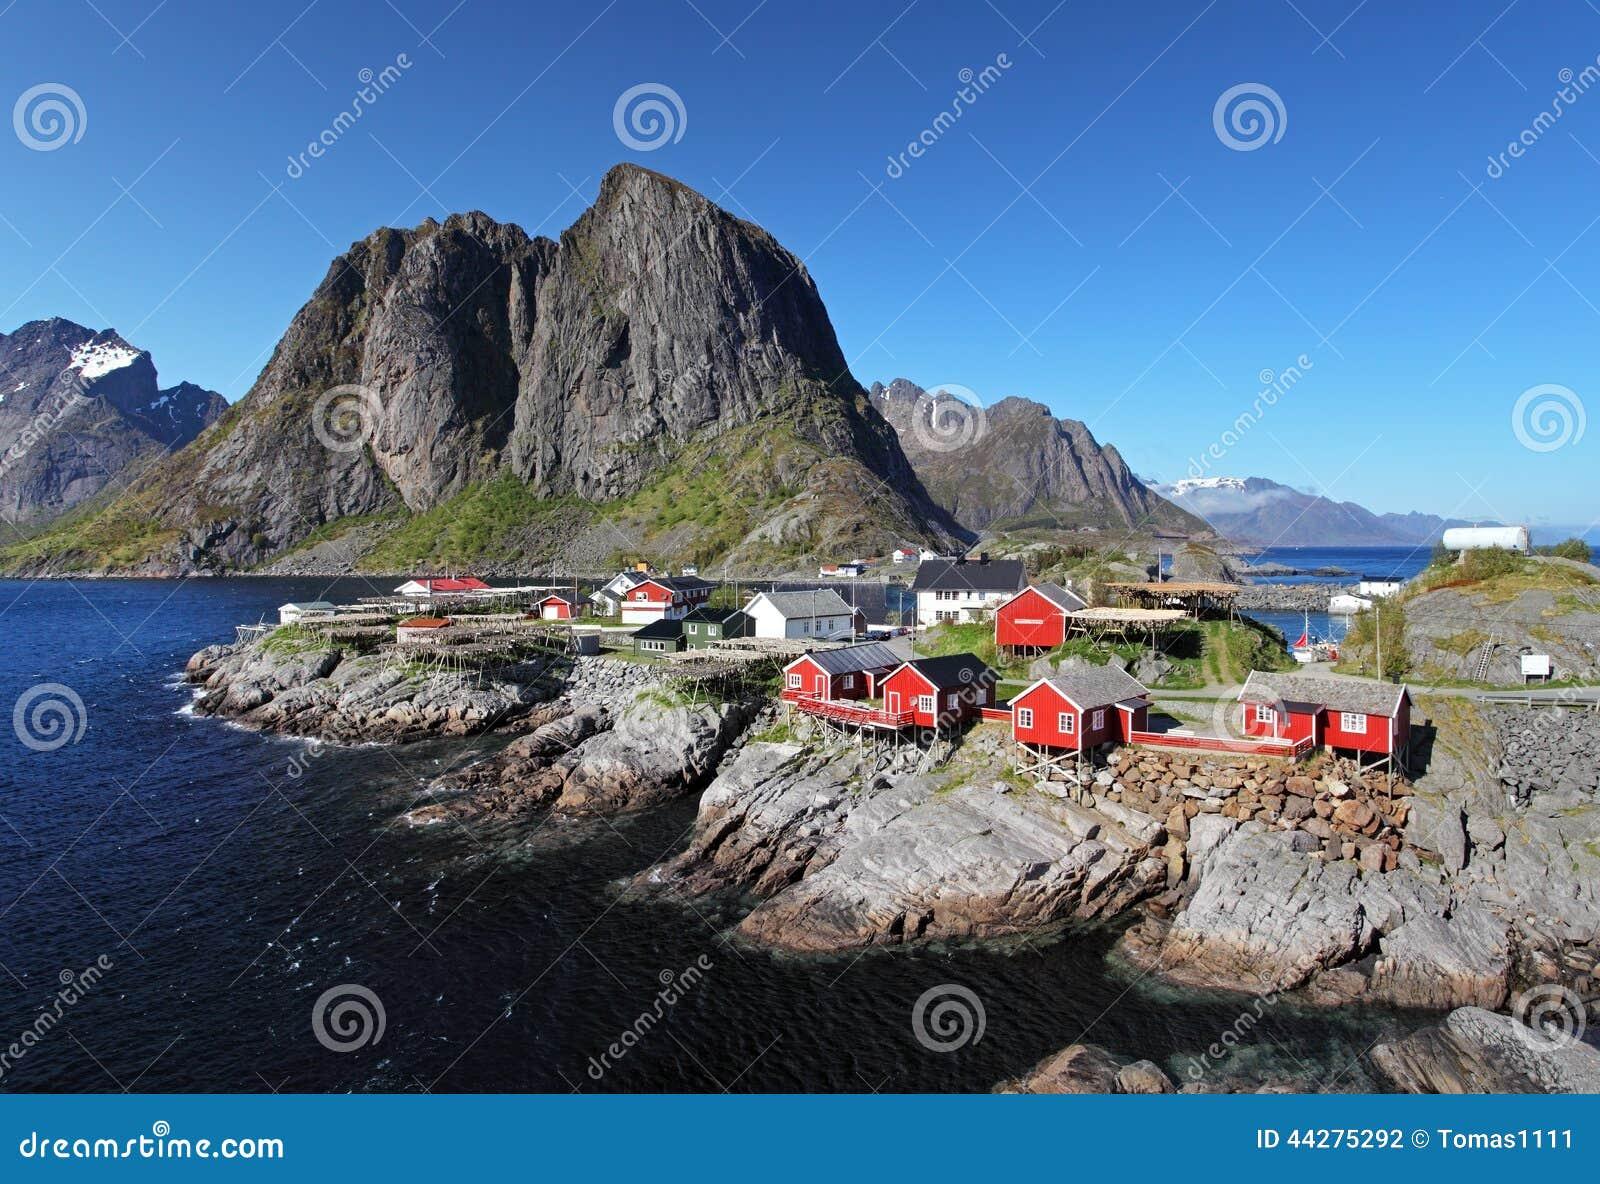 Norwegian fishing village with traditional red rorbu huts, Reine, Lofoten Islands, Norway